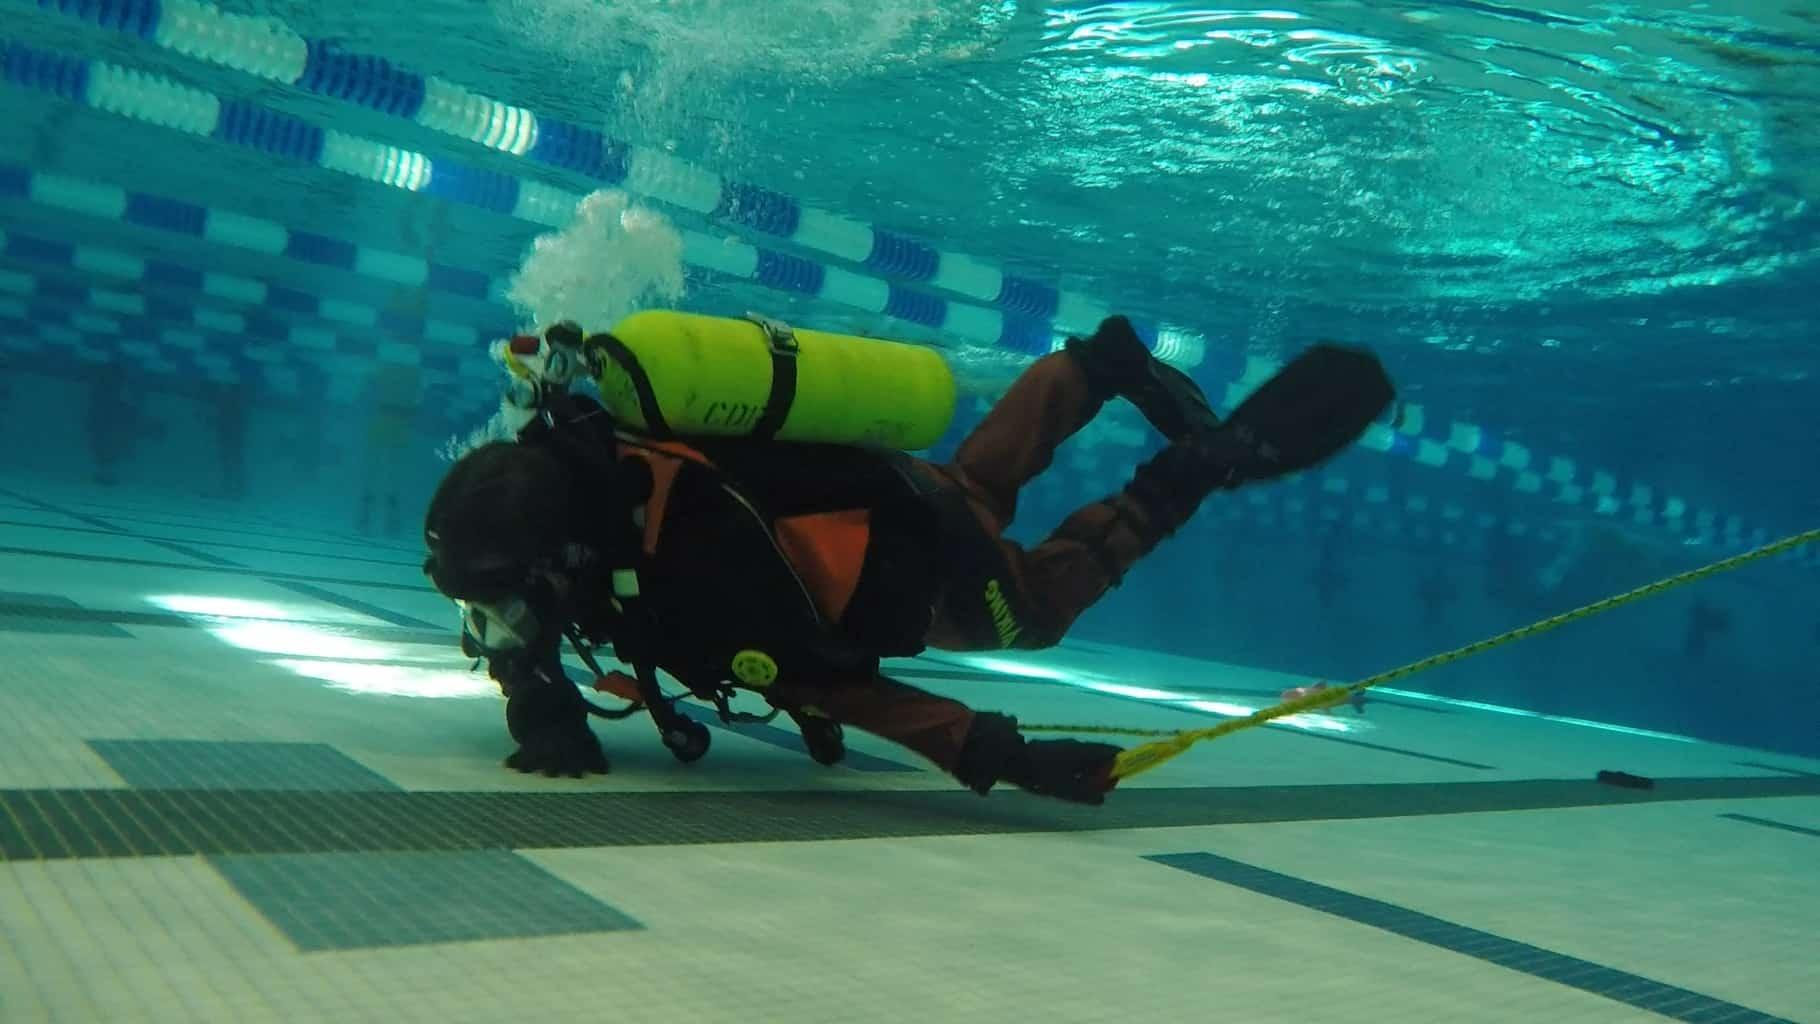 , Dive Rescue I in Boynton Beach, FL coming soon!